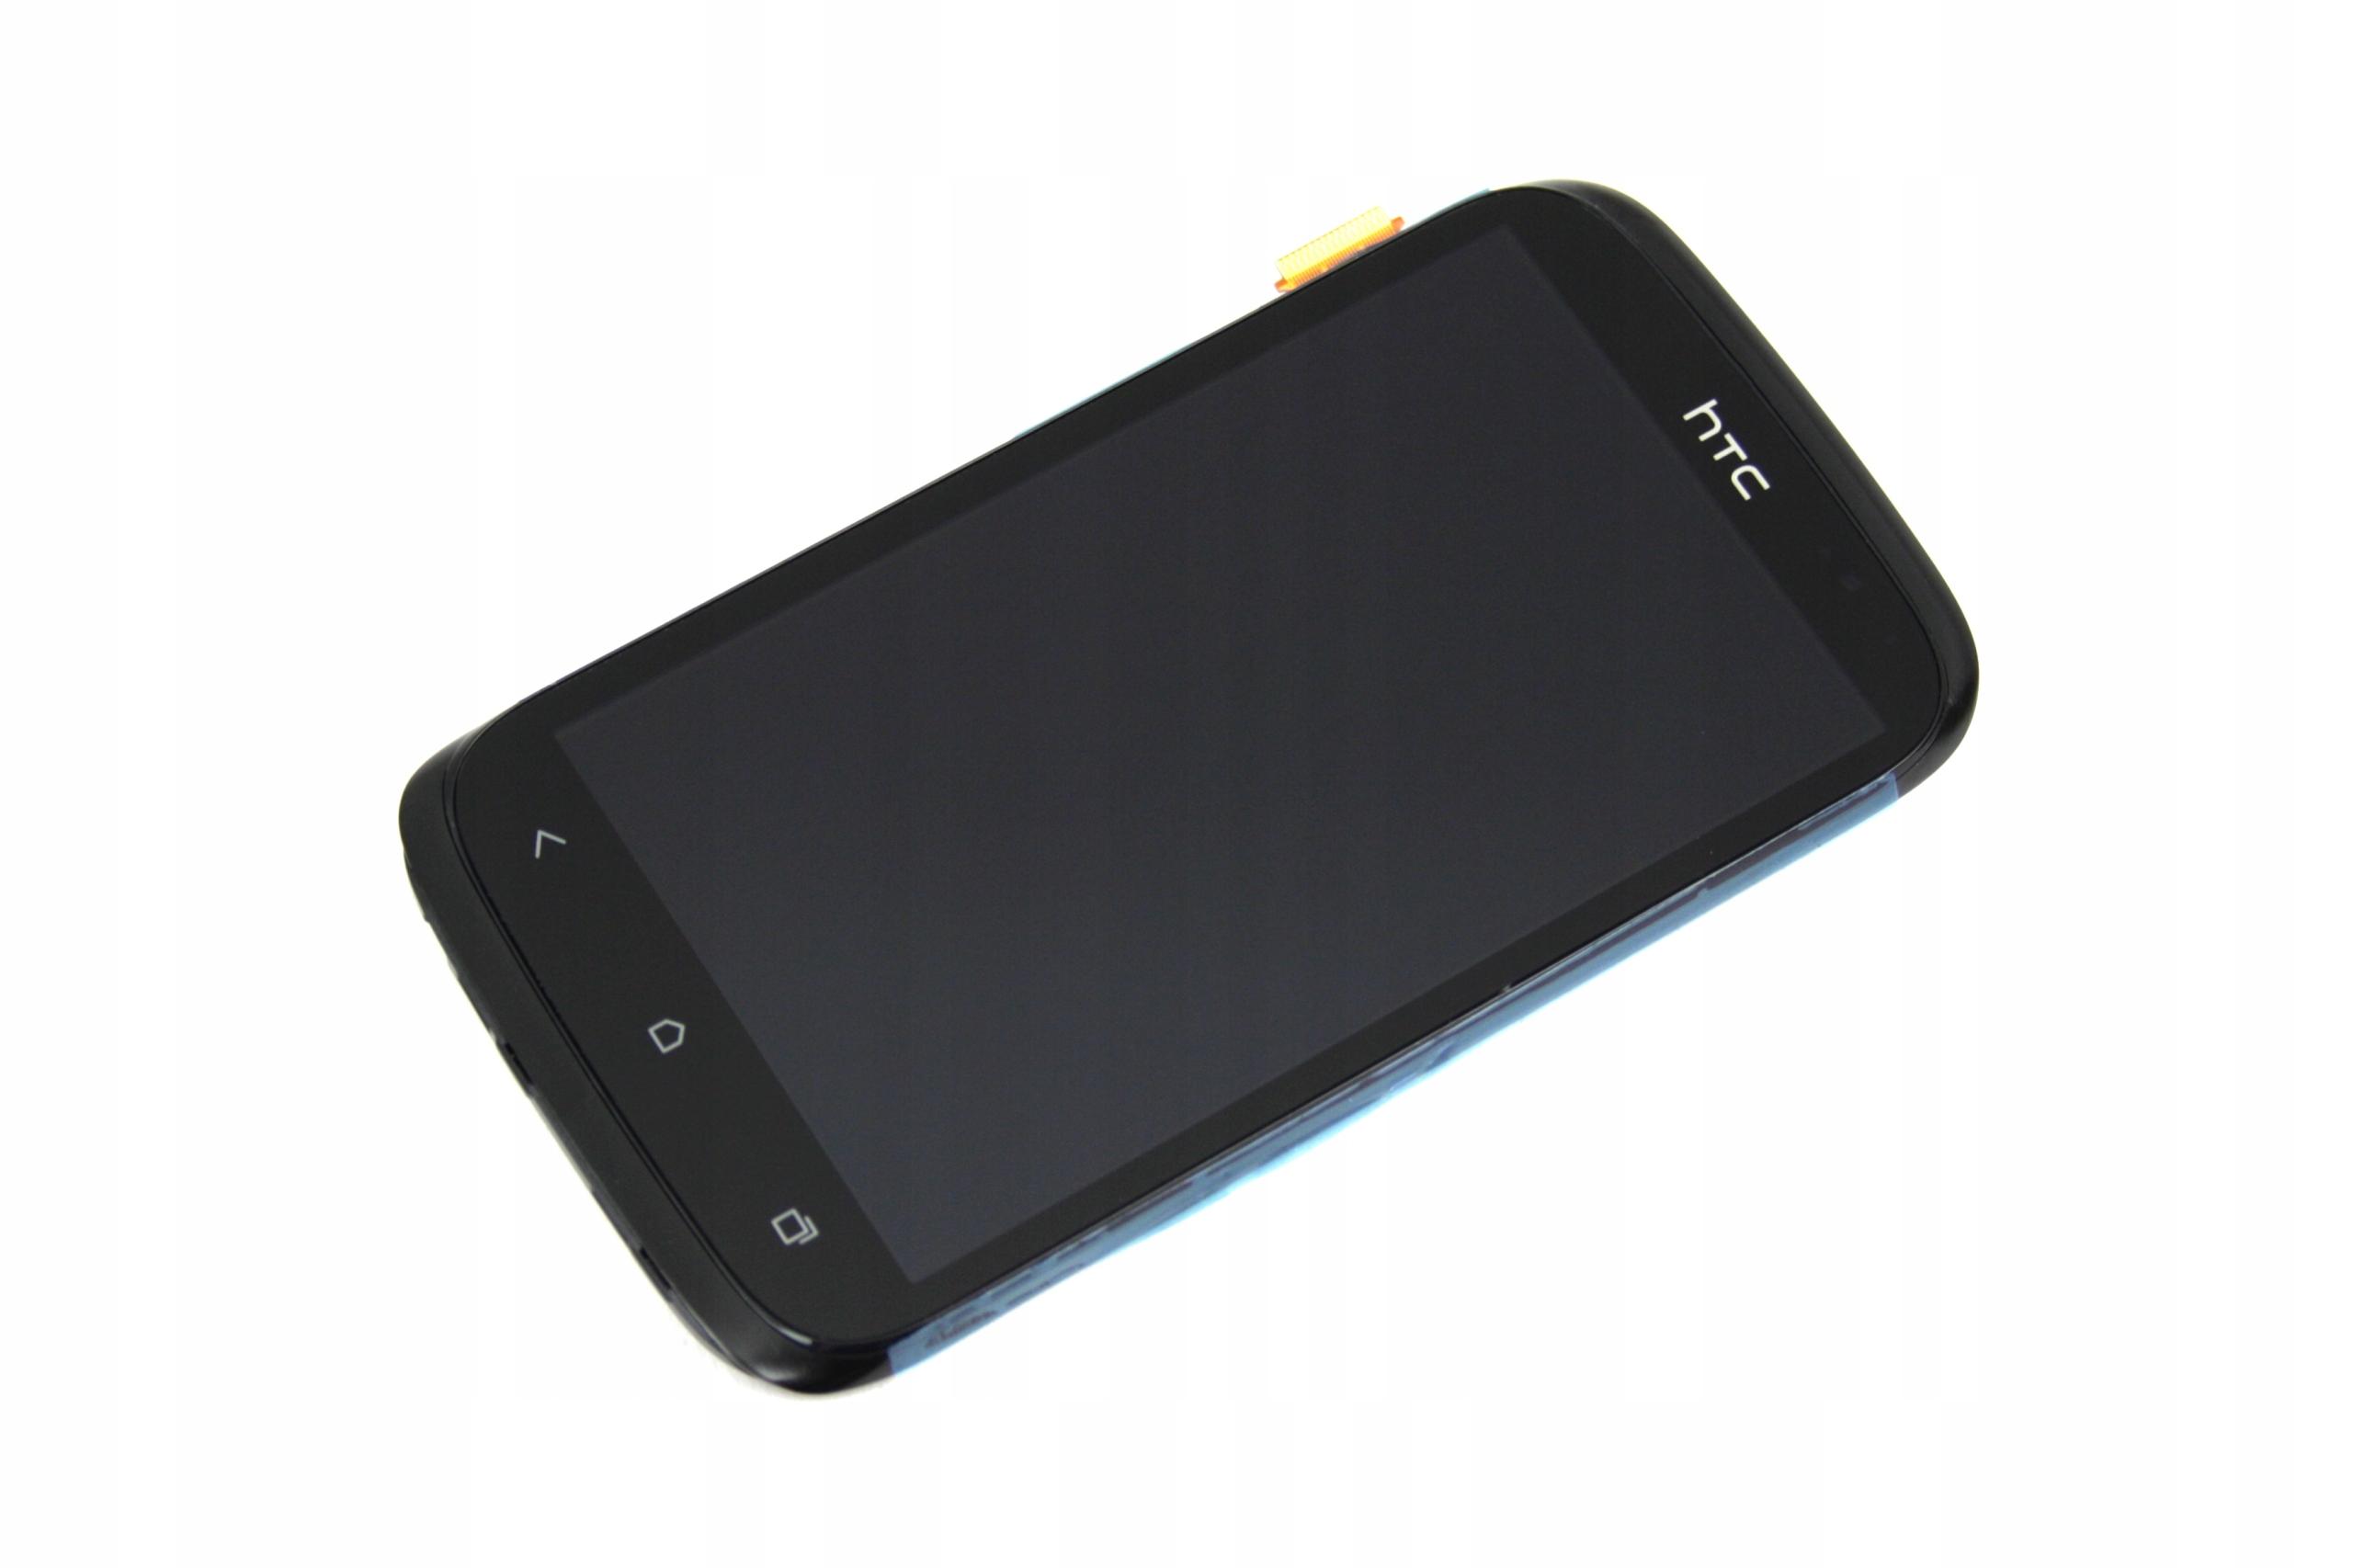 WYŚWIETLACZ EKRAN LCD HTC DESIRE X T328E T328 328E